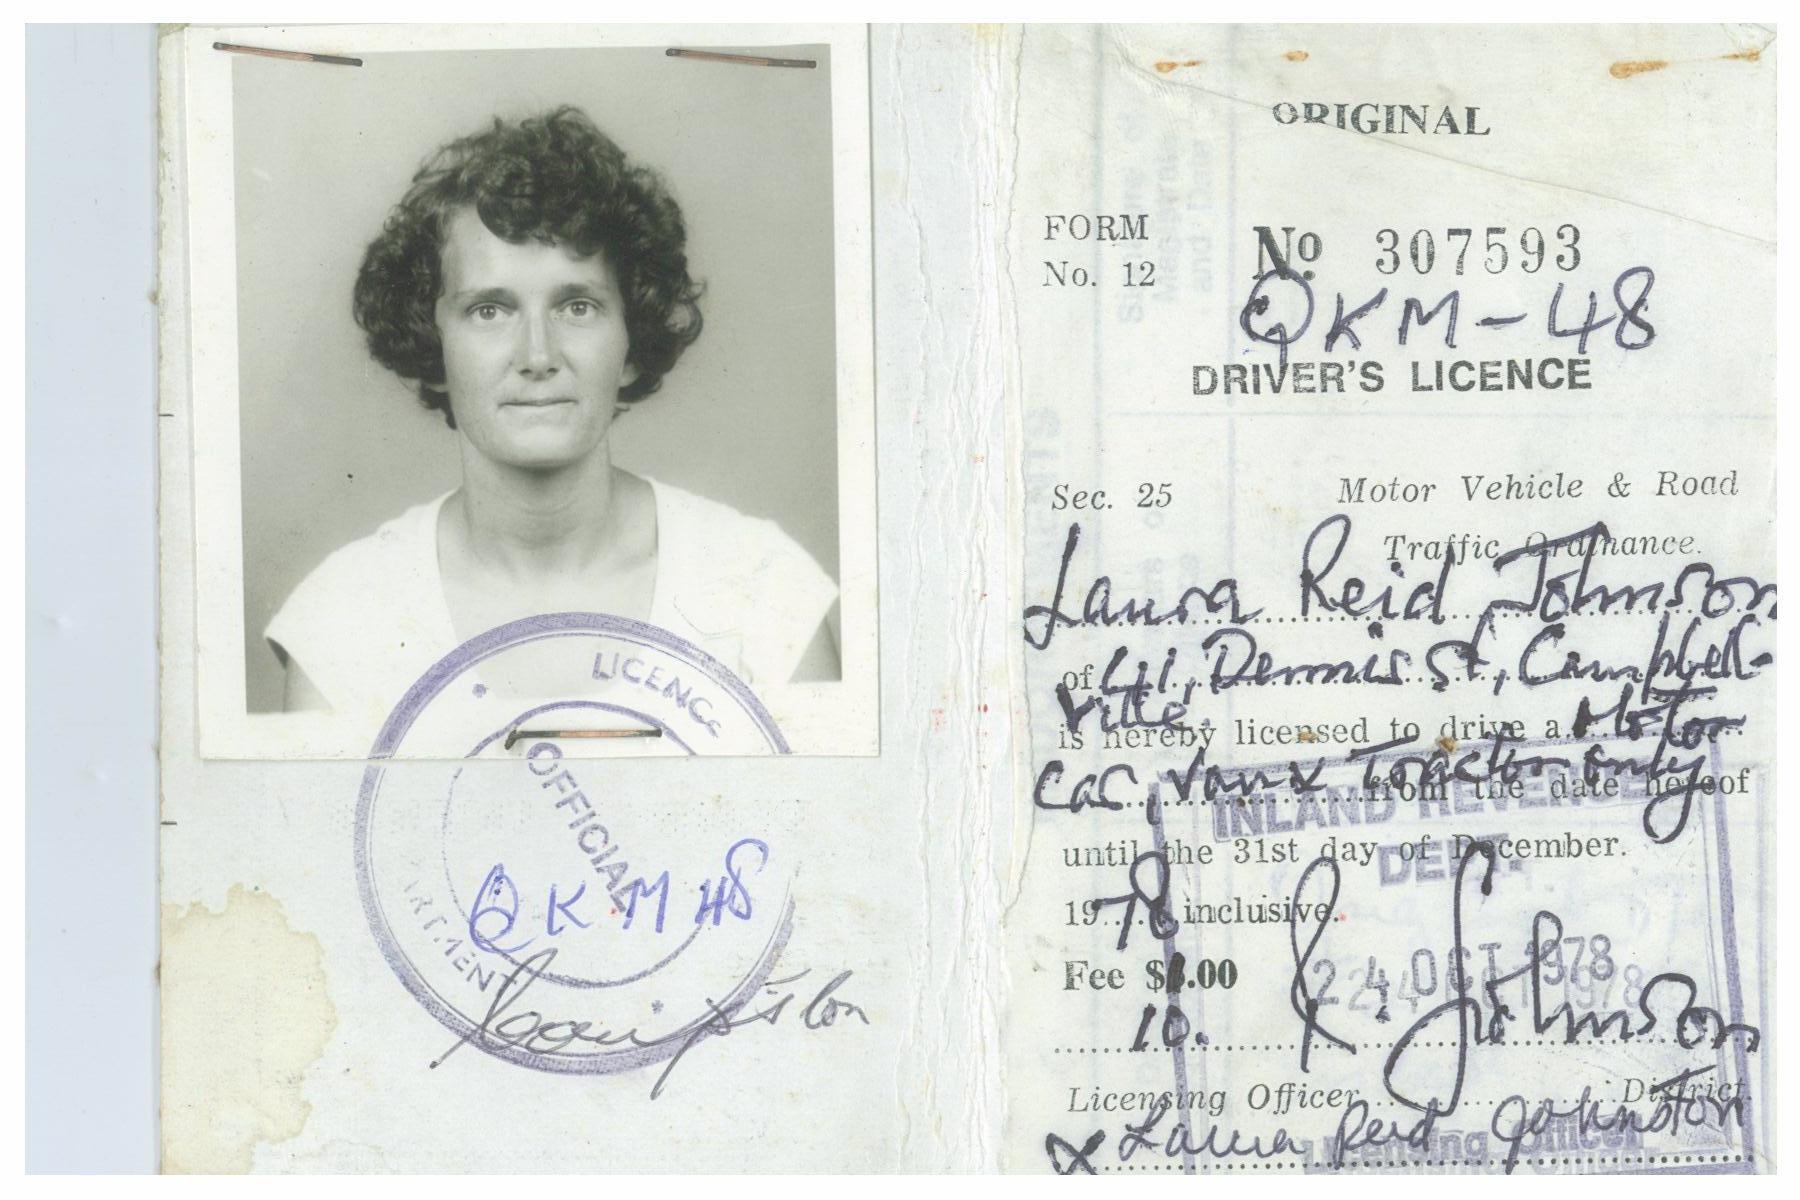 Guyanese Drivers License of Laura Johnston Kohl. Photo courtesy of Laura Johnston Kohl via Peoples Temple/Jonestown Gallery (Flickr)